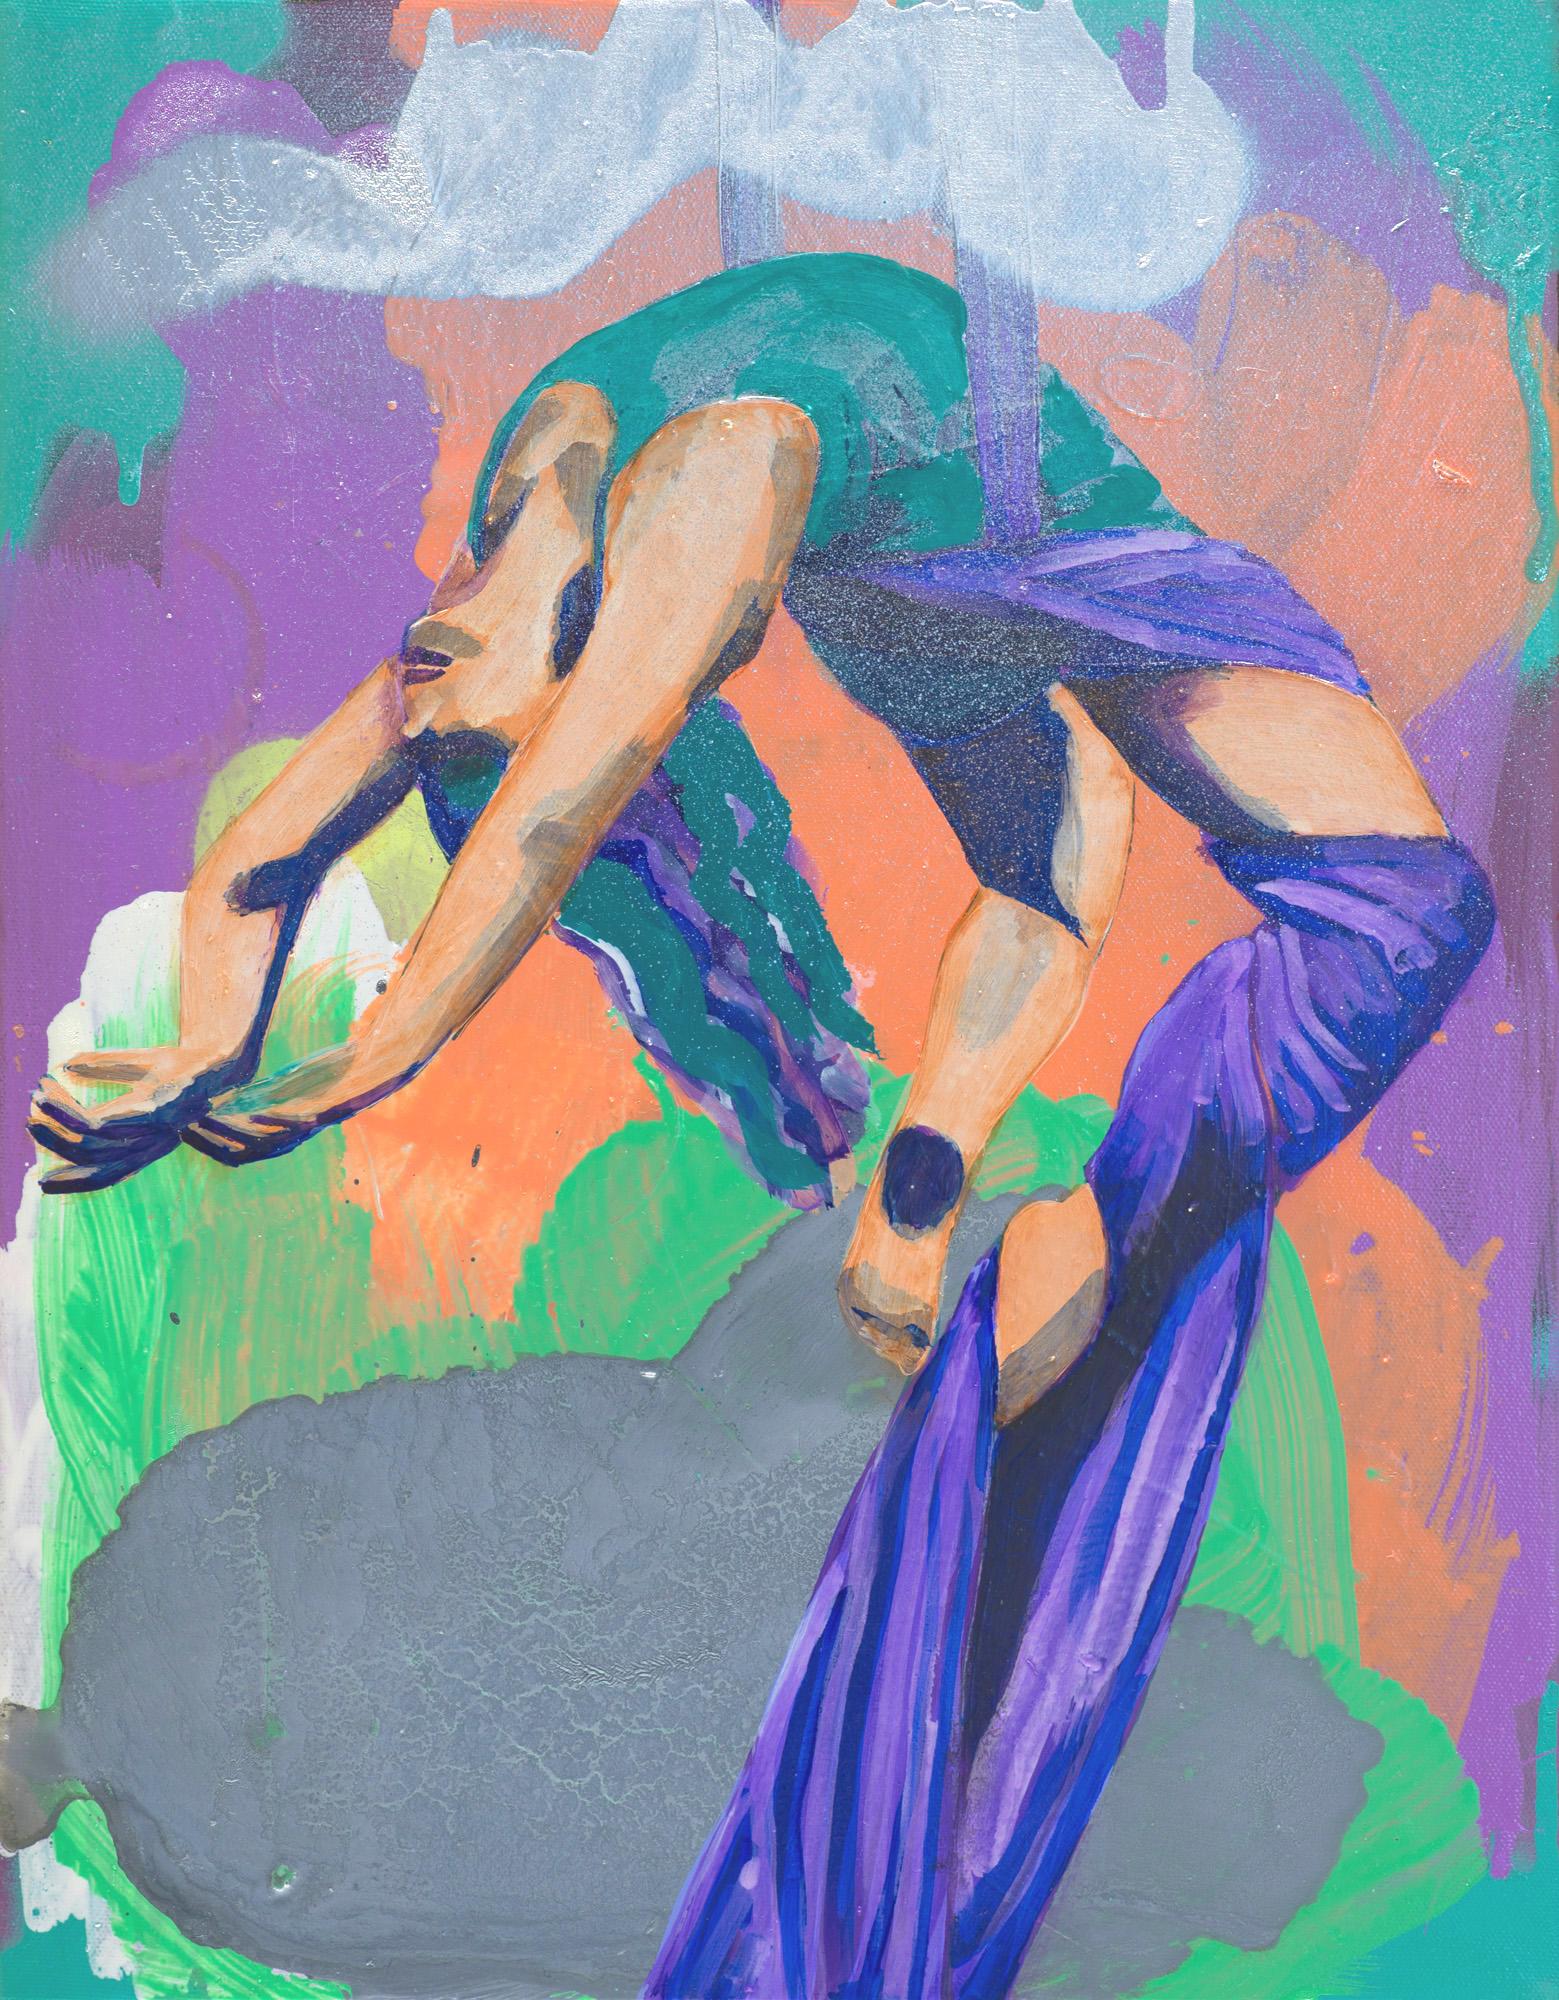 Study for Central Sun  2017 oil and spray paint on canvas 45.5 x 35.5cm